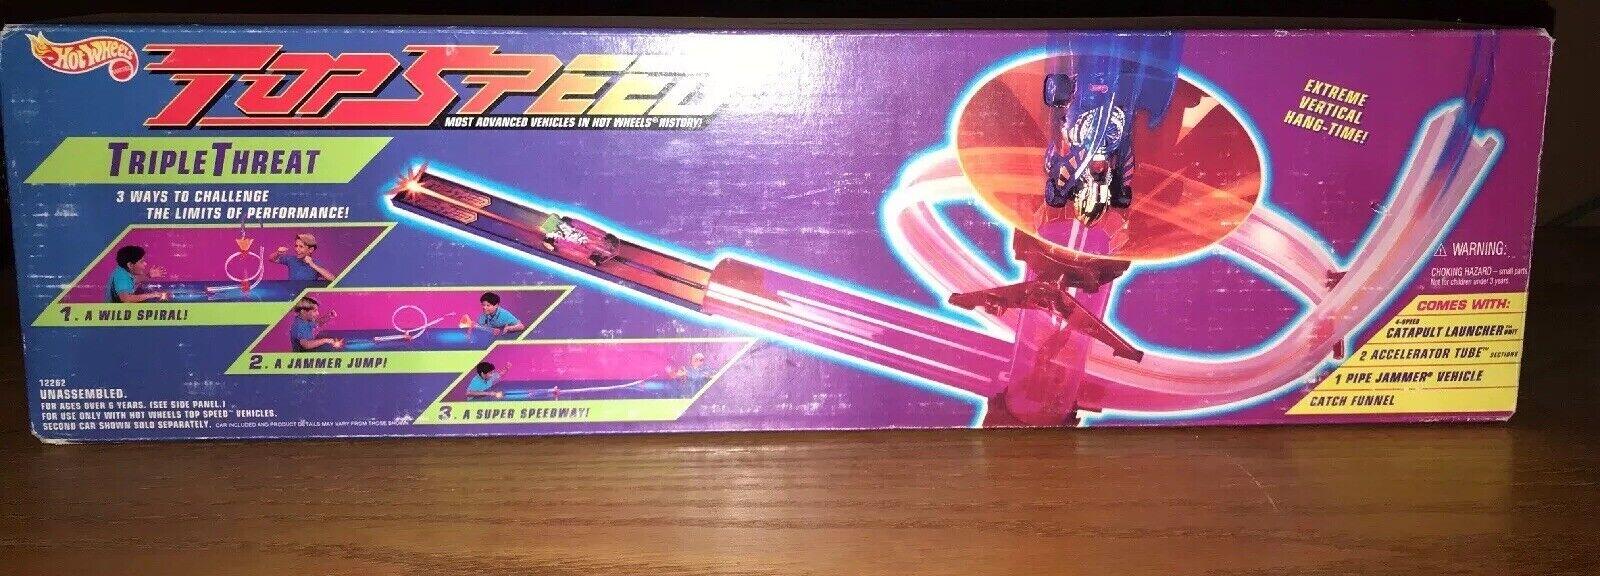 In Original Box Vintage Mattel HOT WHEELS Top Speed Triple Threat Set. Complete